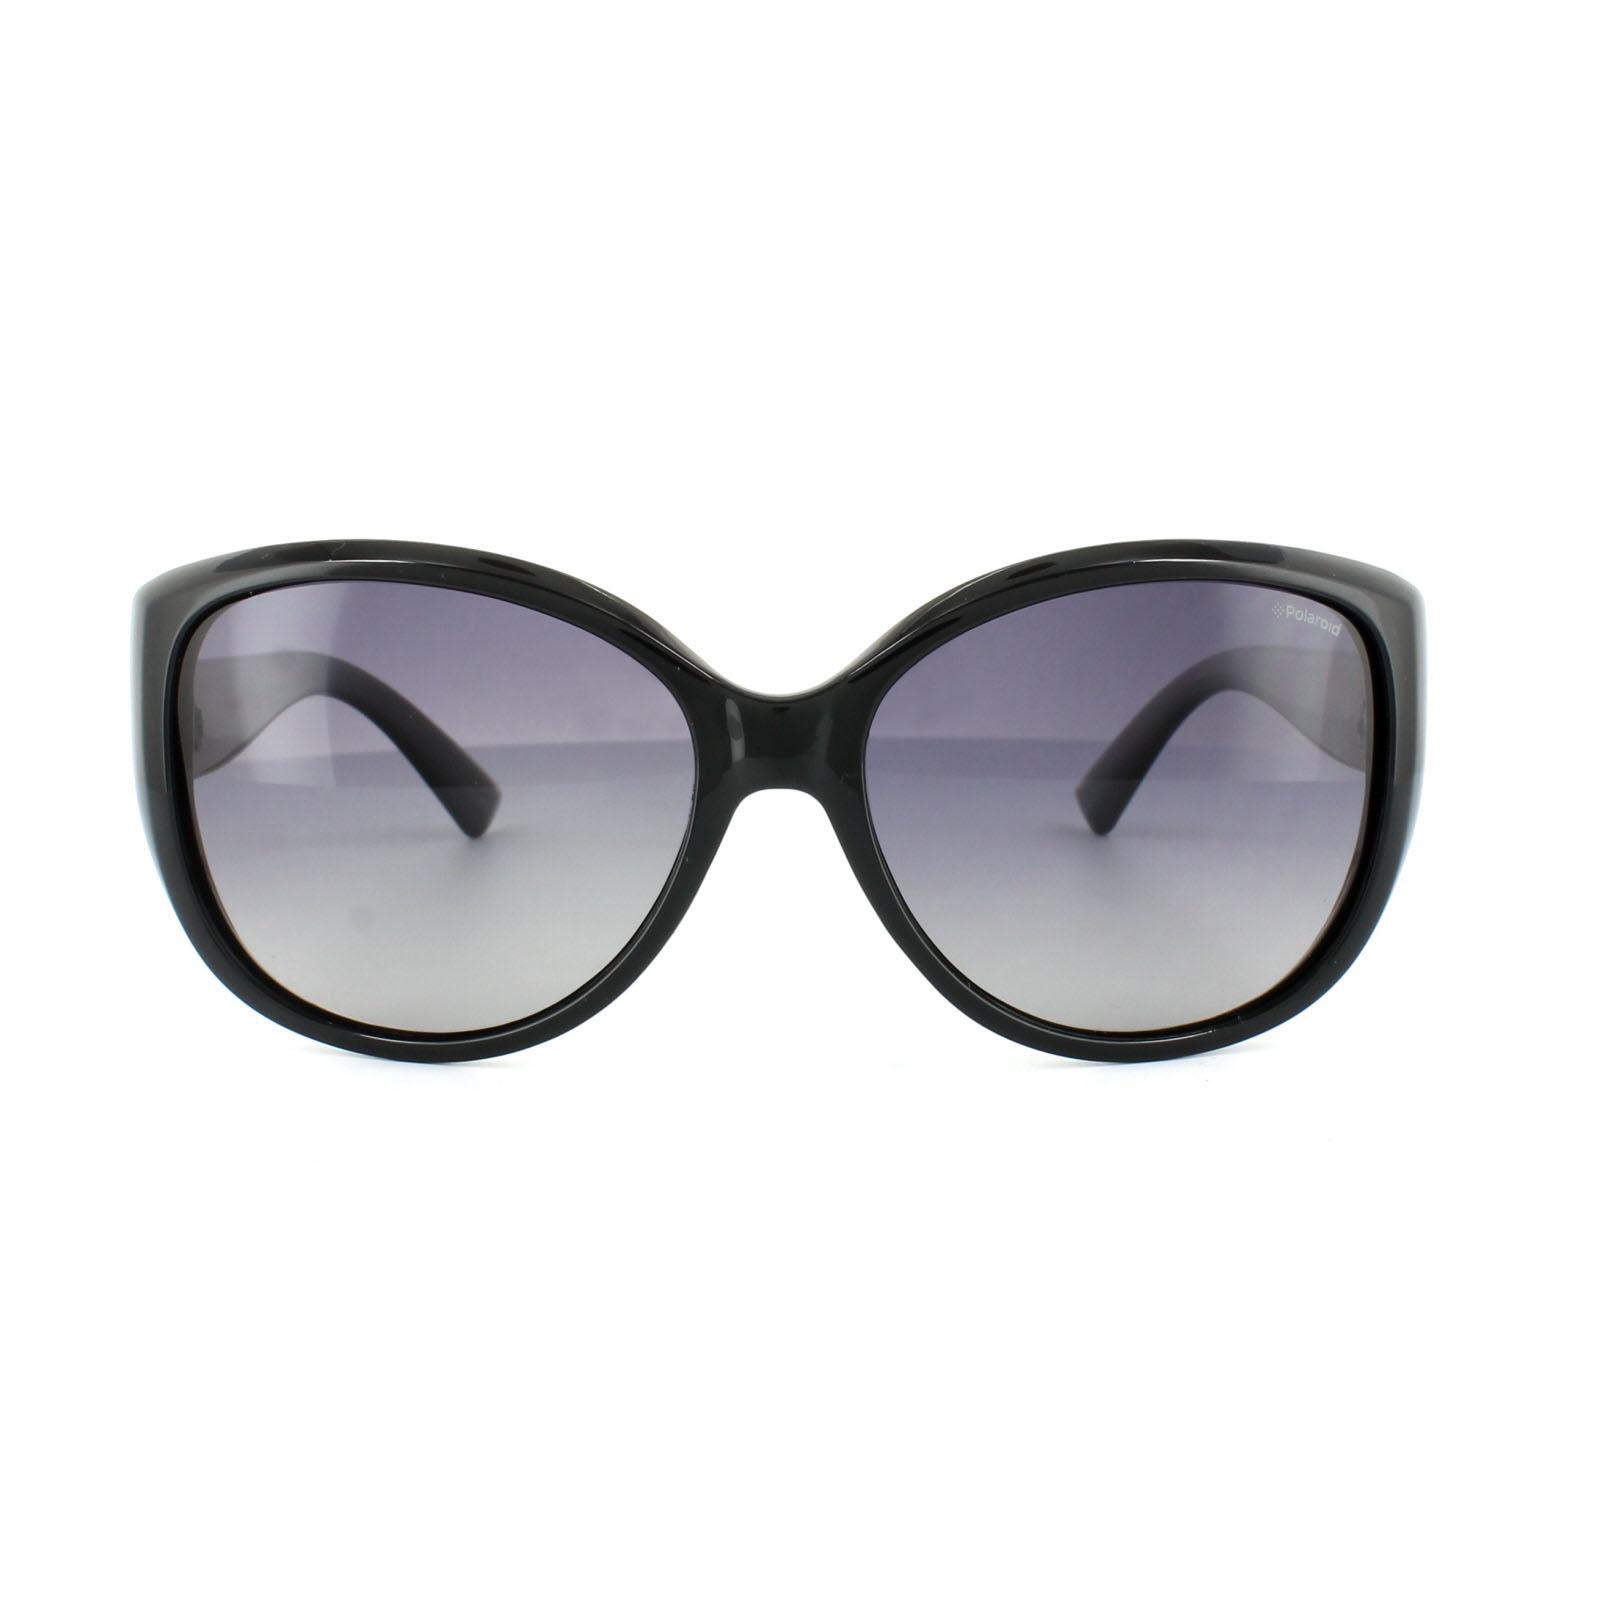 Cheap Polaroid 4031 S Sunglasses - Discounted Sunglasses da8bfb61188